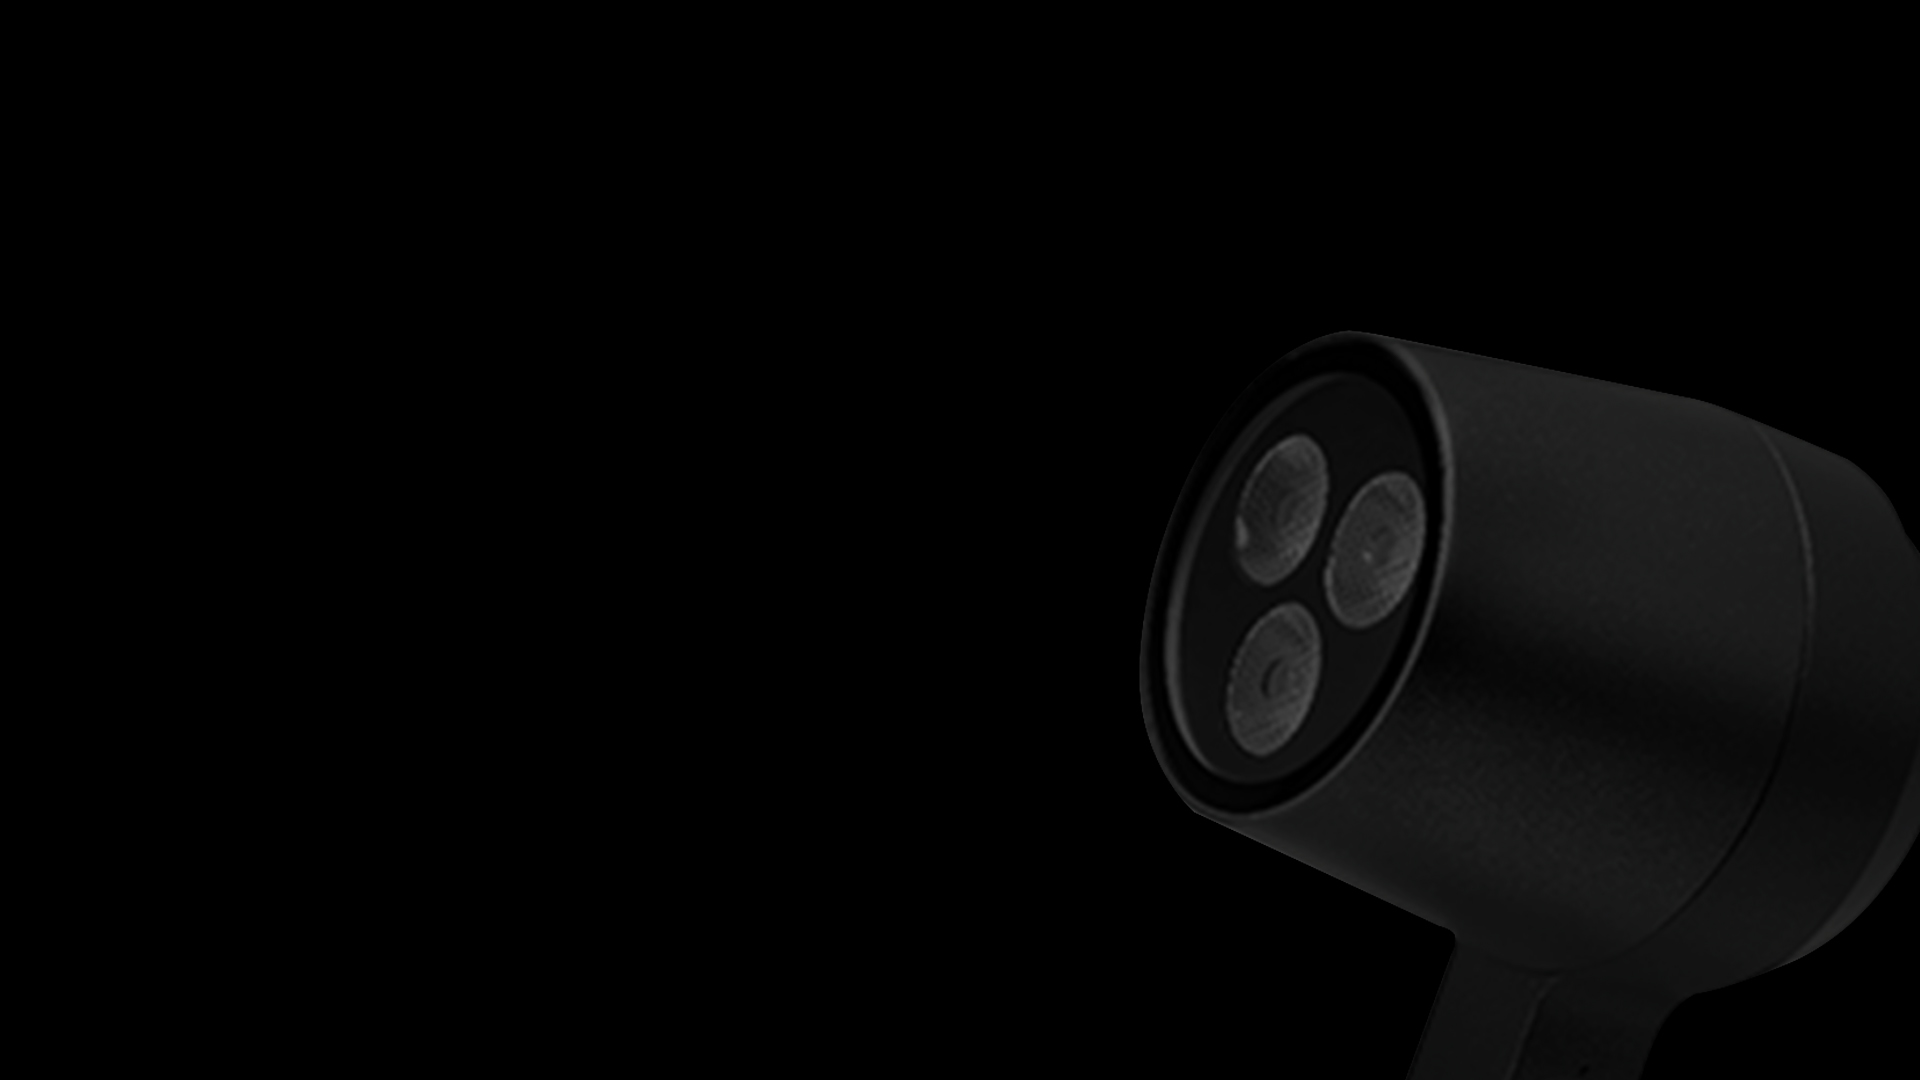 RING: HIGHEST LIGHT CONTROL